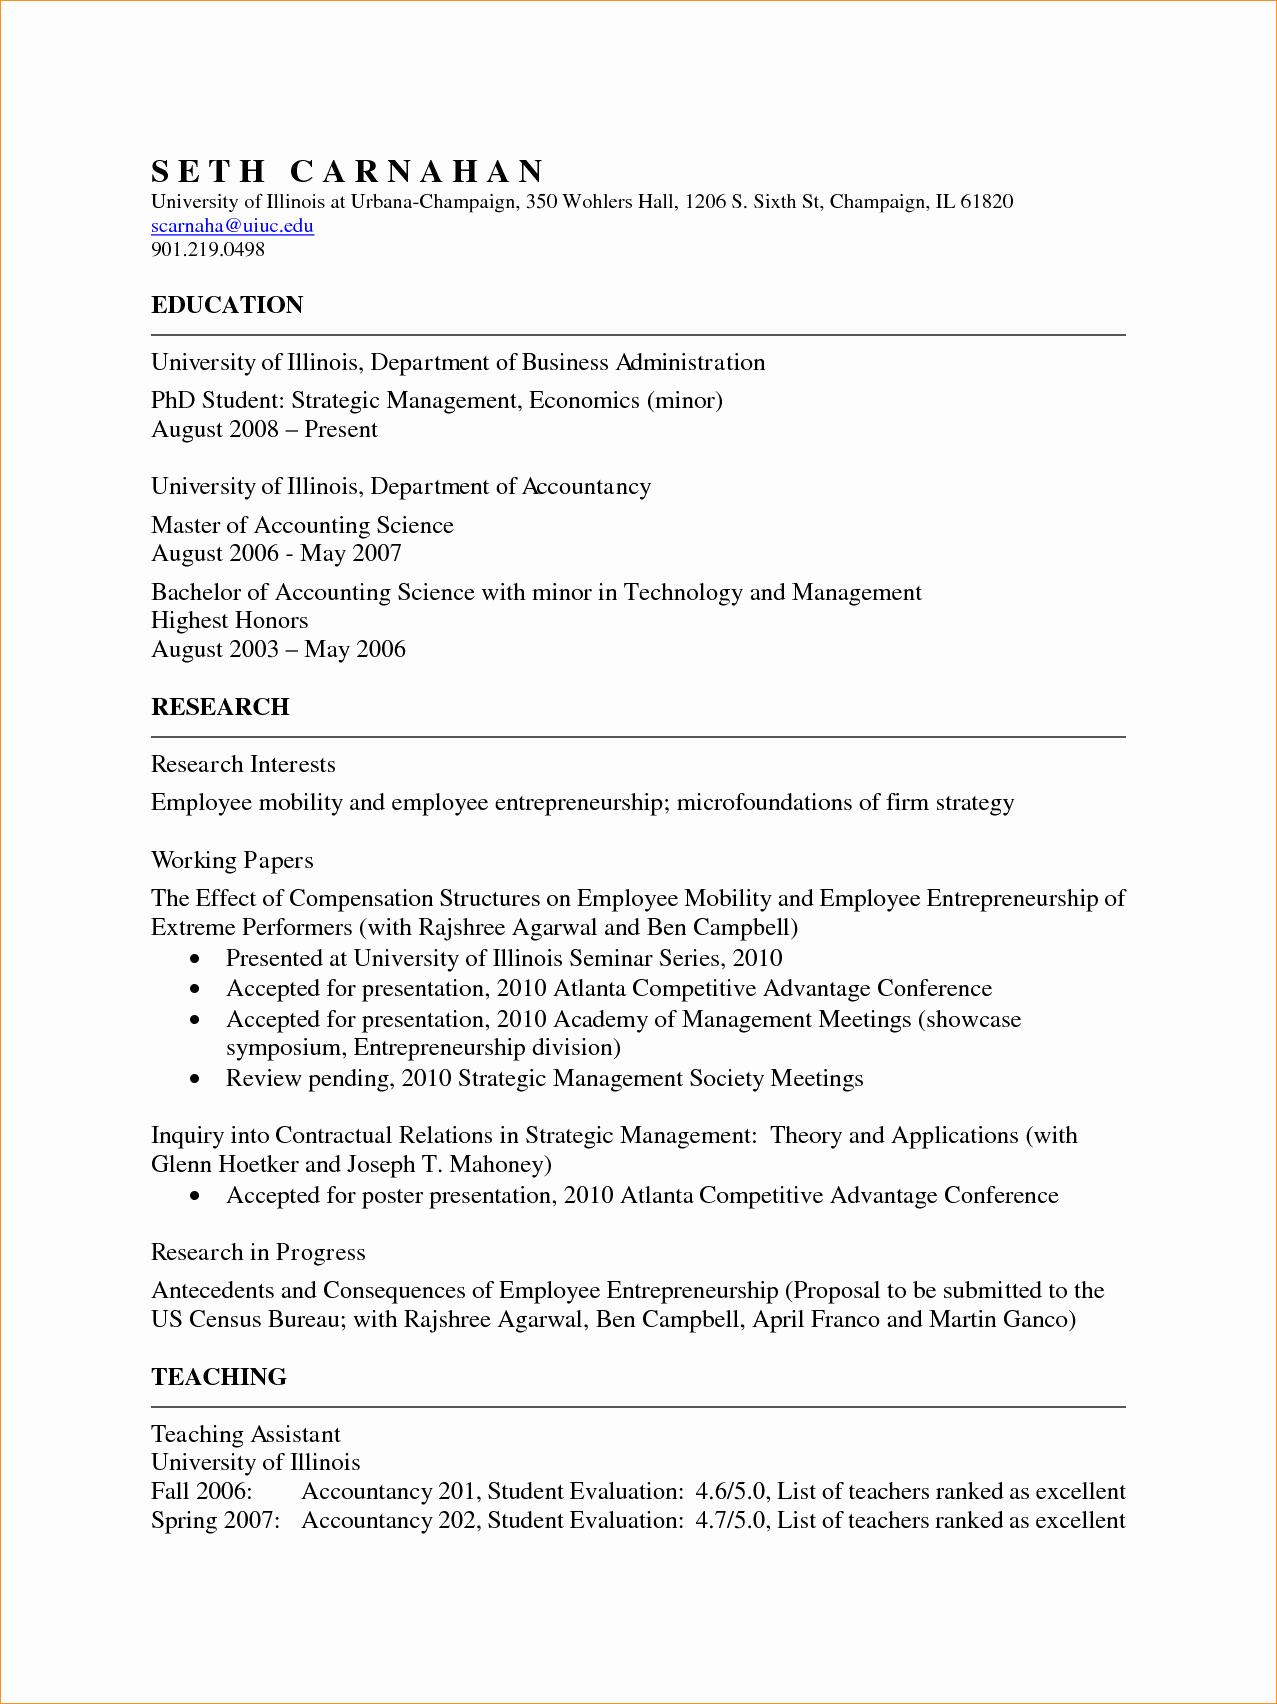 Academic Curriculum Vitae Template Beautiful Academic Cv Template Business Proposal Templated